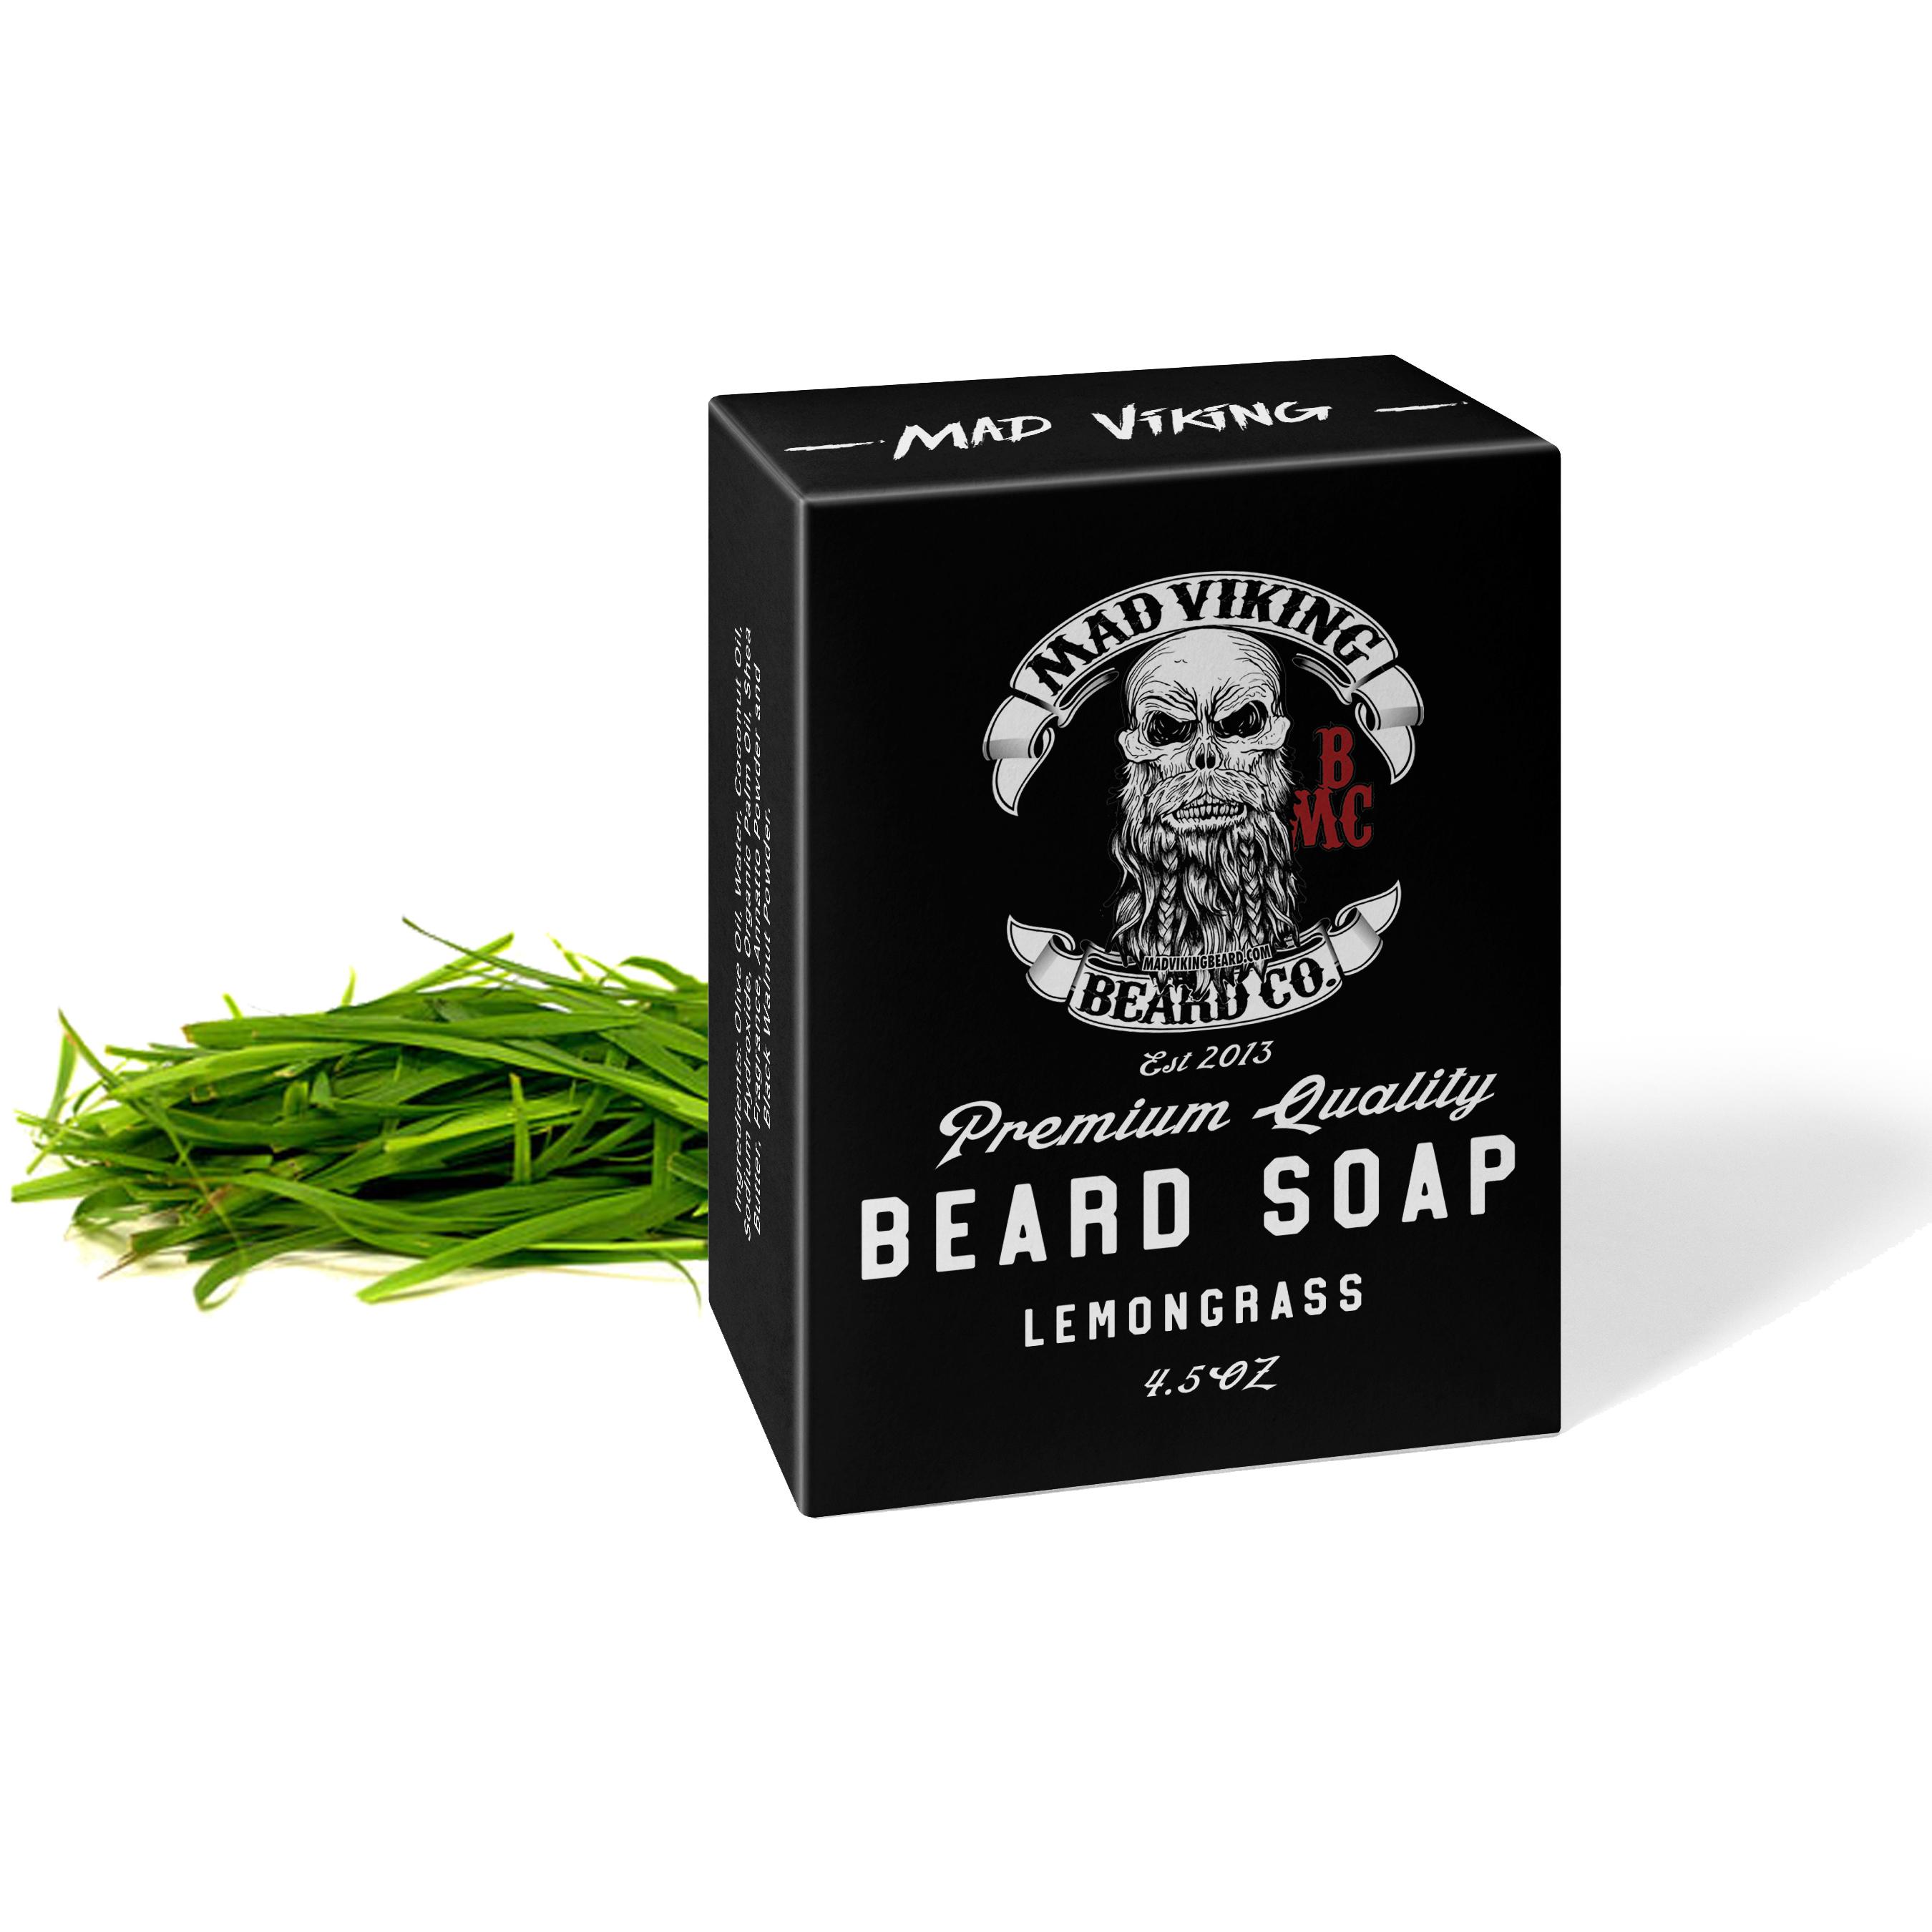 Mad Viking Lemongrass Soap